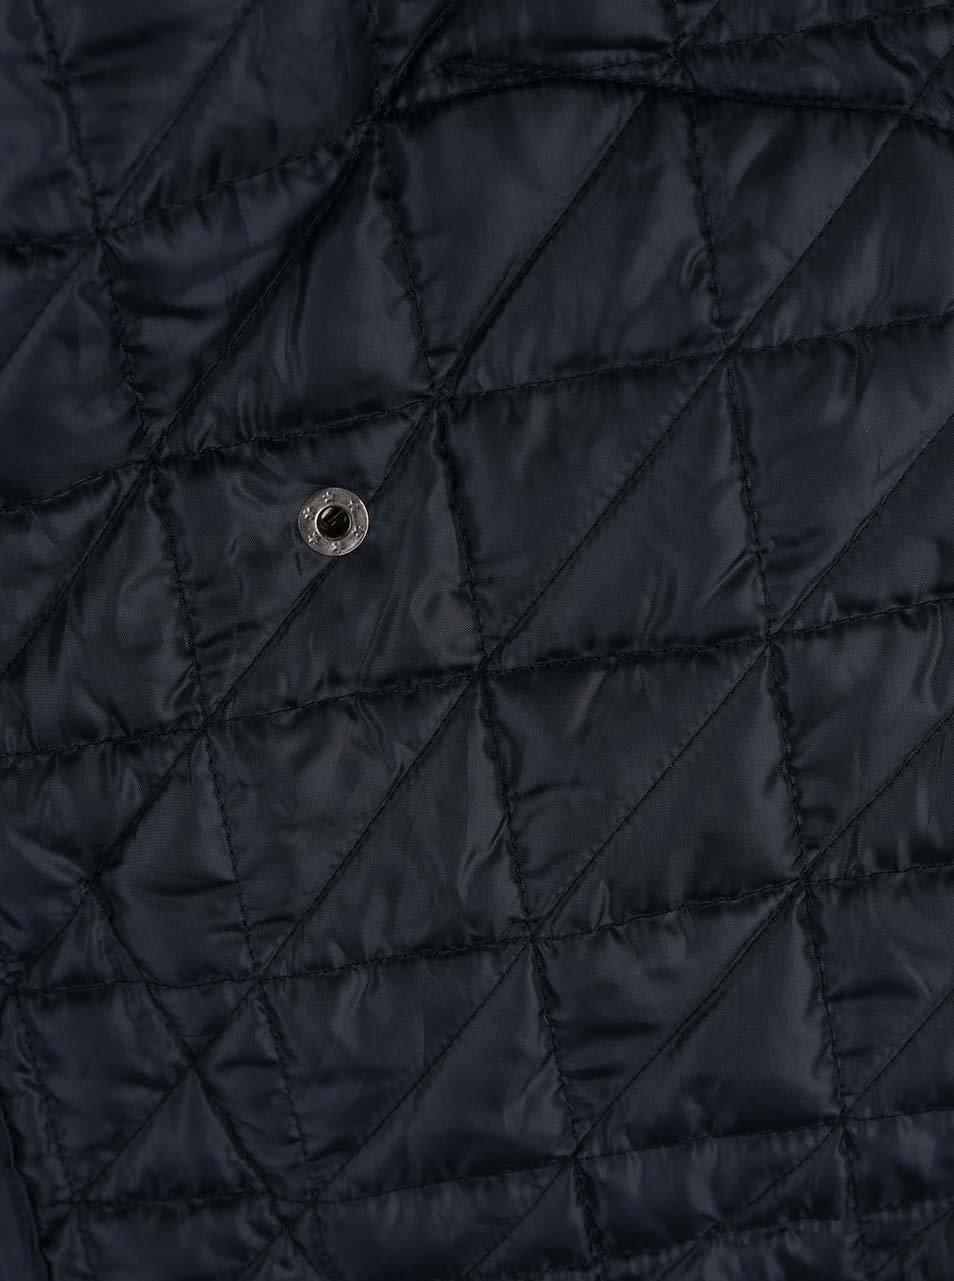 fd1b165c9f Tmavomodrá prešívaná bunda Shine Original Travis ...